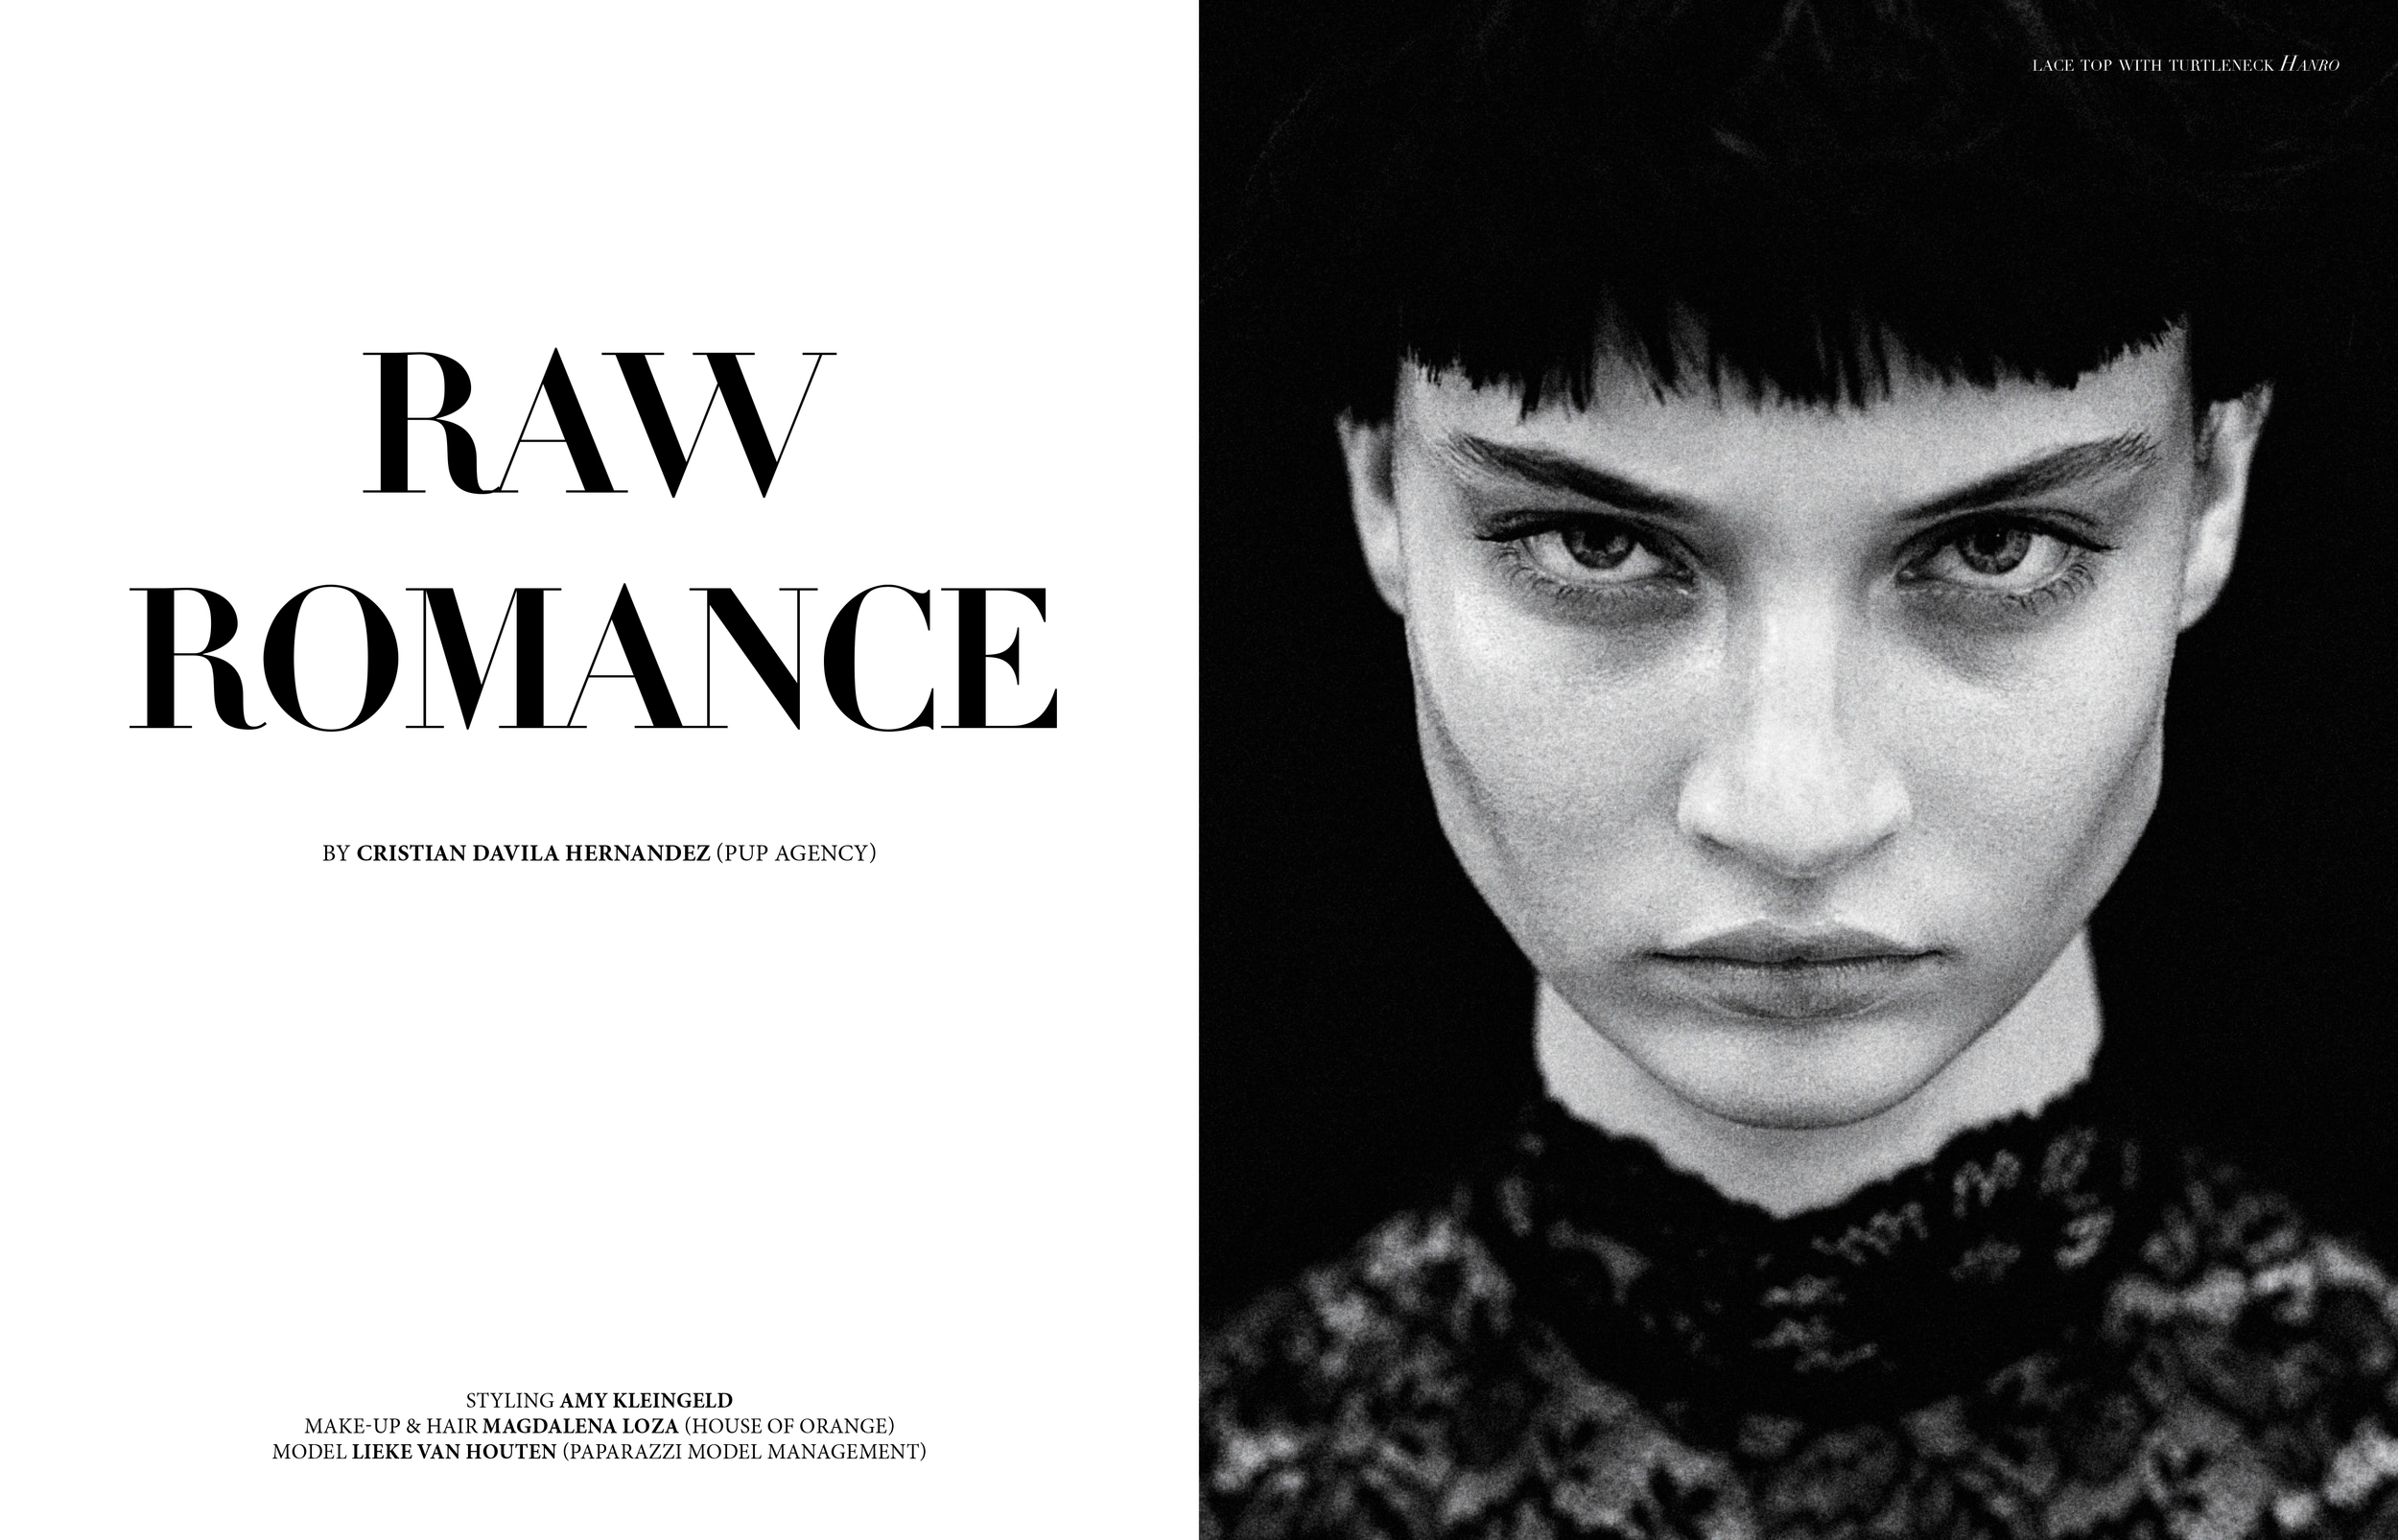 Raw Romance by Cristian Davila Hernandez